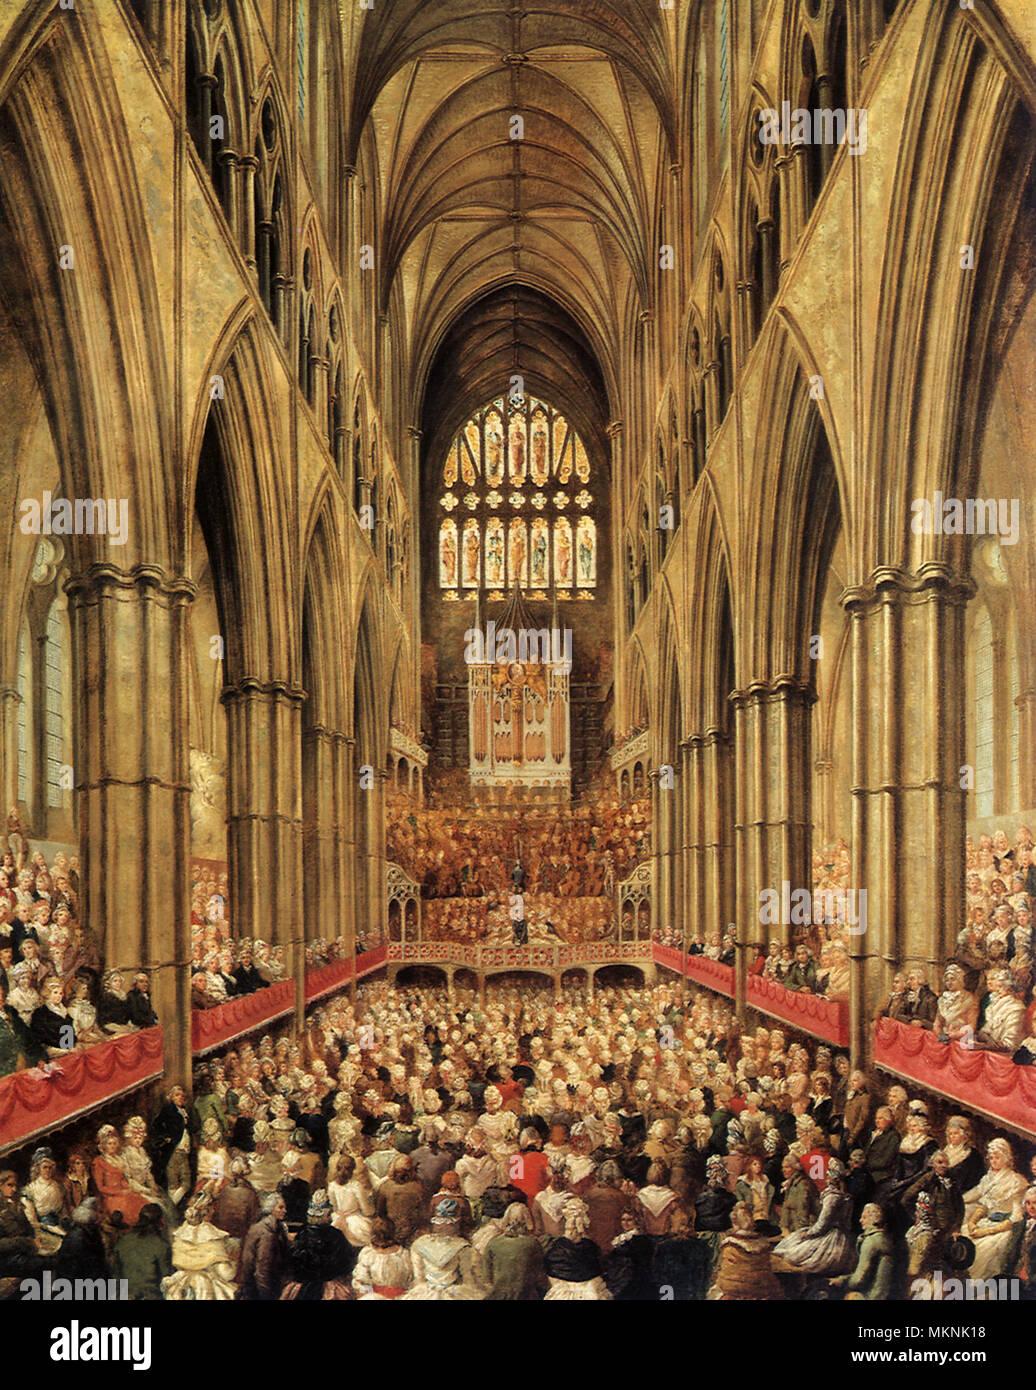 Commemoration of Handel's Centenary - Stock Image